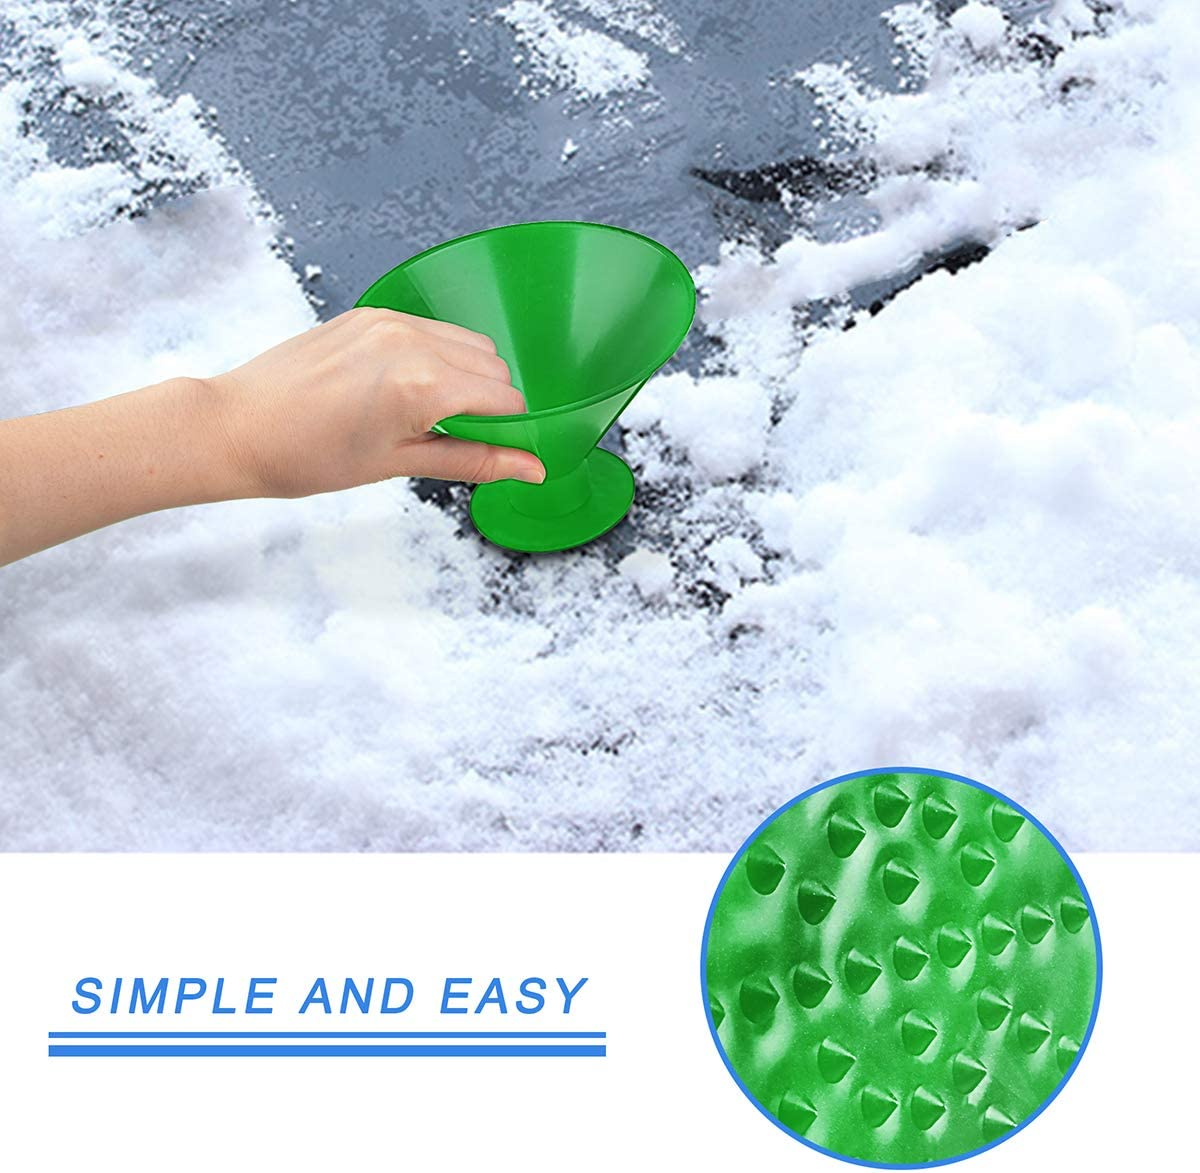 WeGuard Magical Car Ice Scraper Car Snow Removal Shovel Tool Cone-Shaped Ice Scrapers Car Windshield